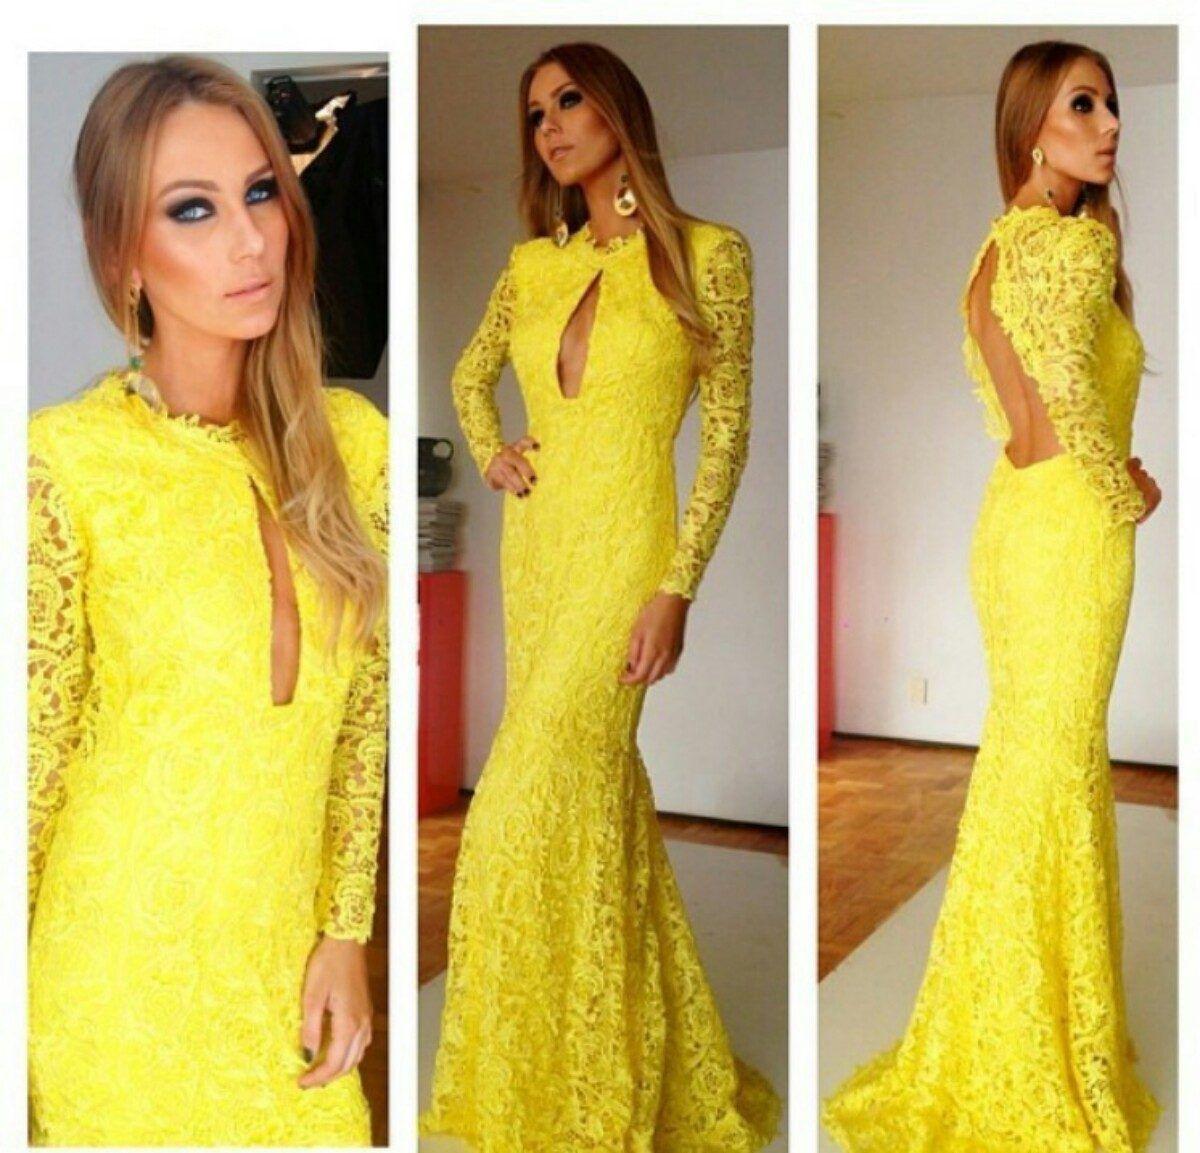 Yellow Mermaid Prom Dresses 2014 Yellow Lace Pro...